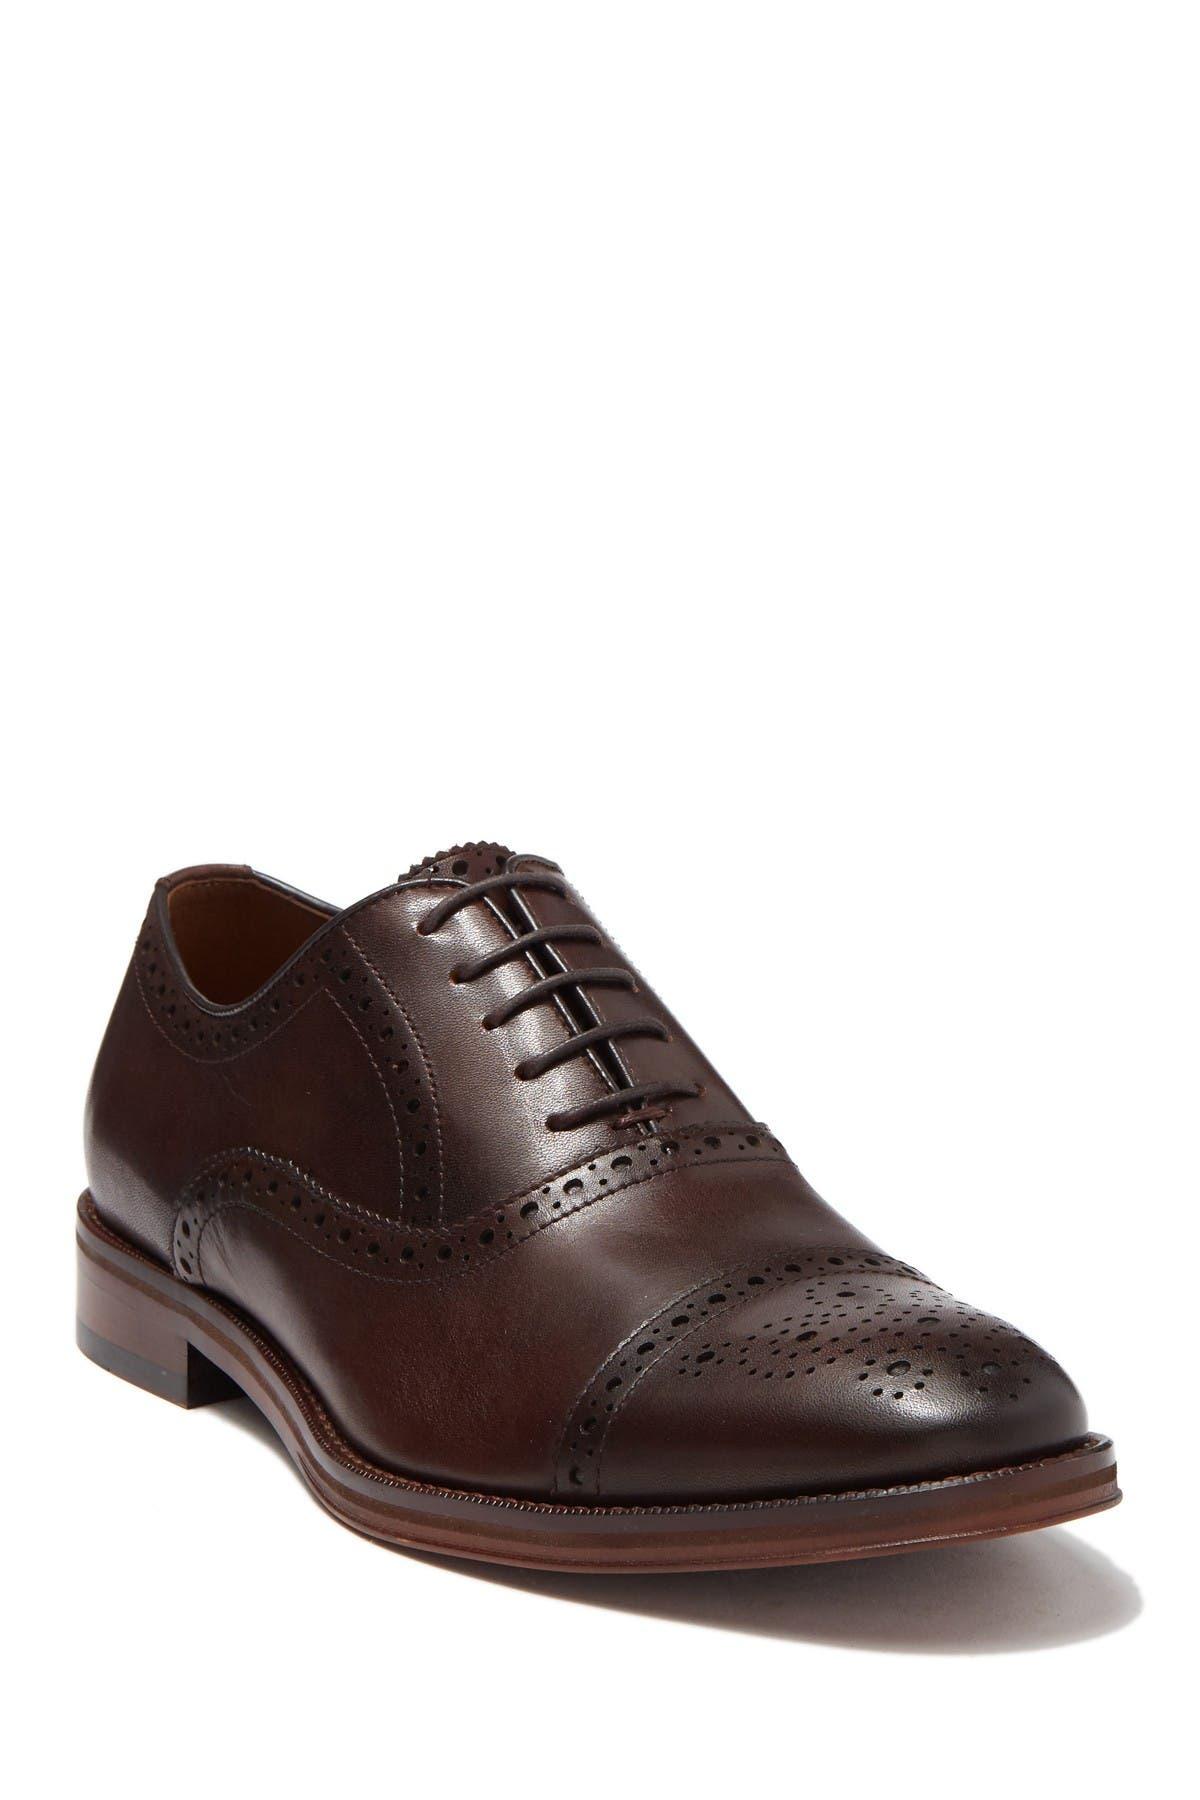 Gordon Rush   Gabriel Cap Toe Leather